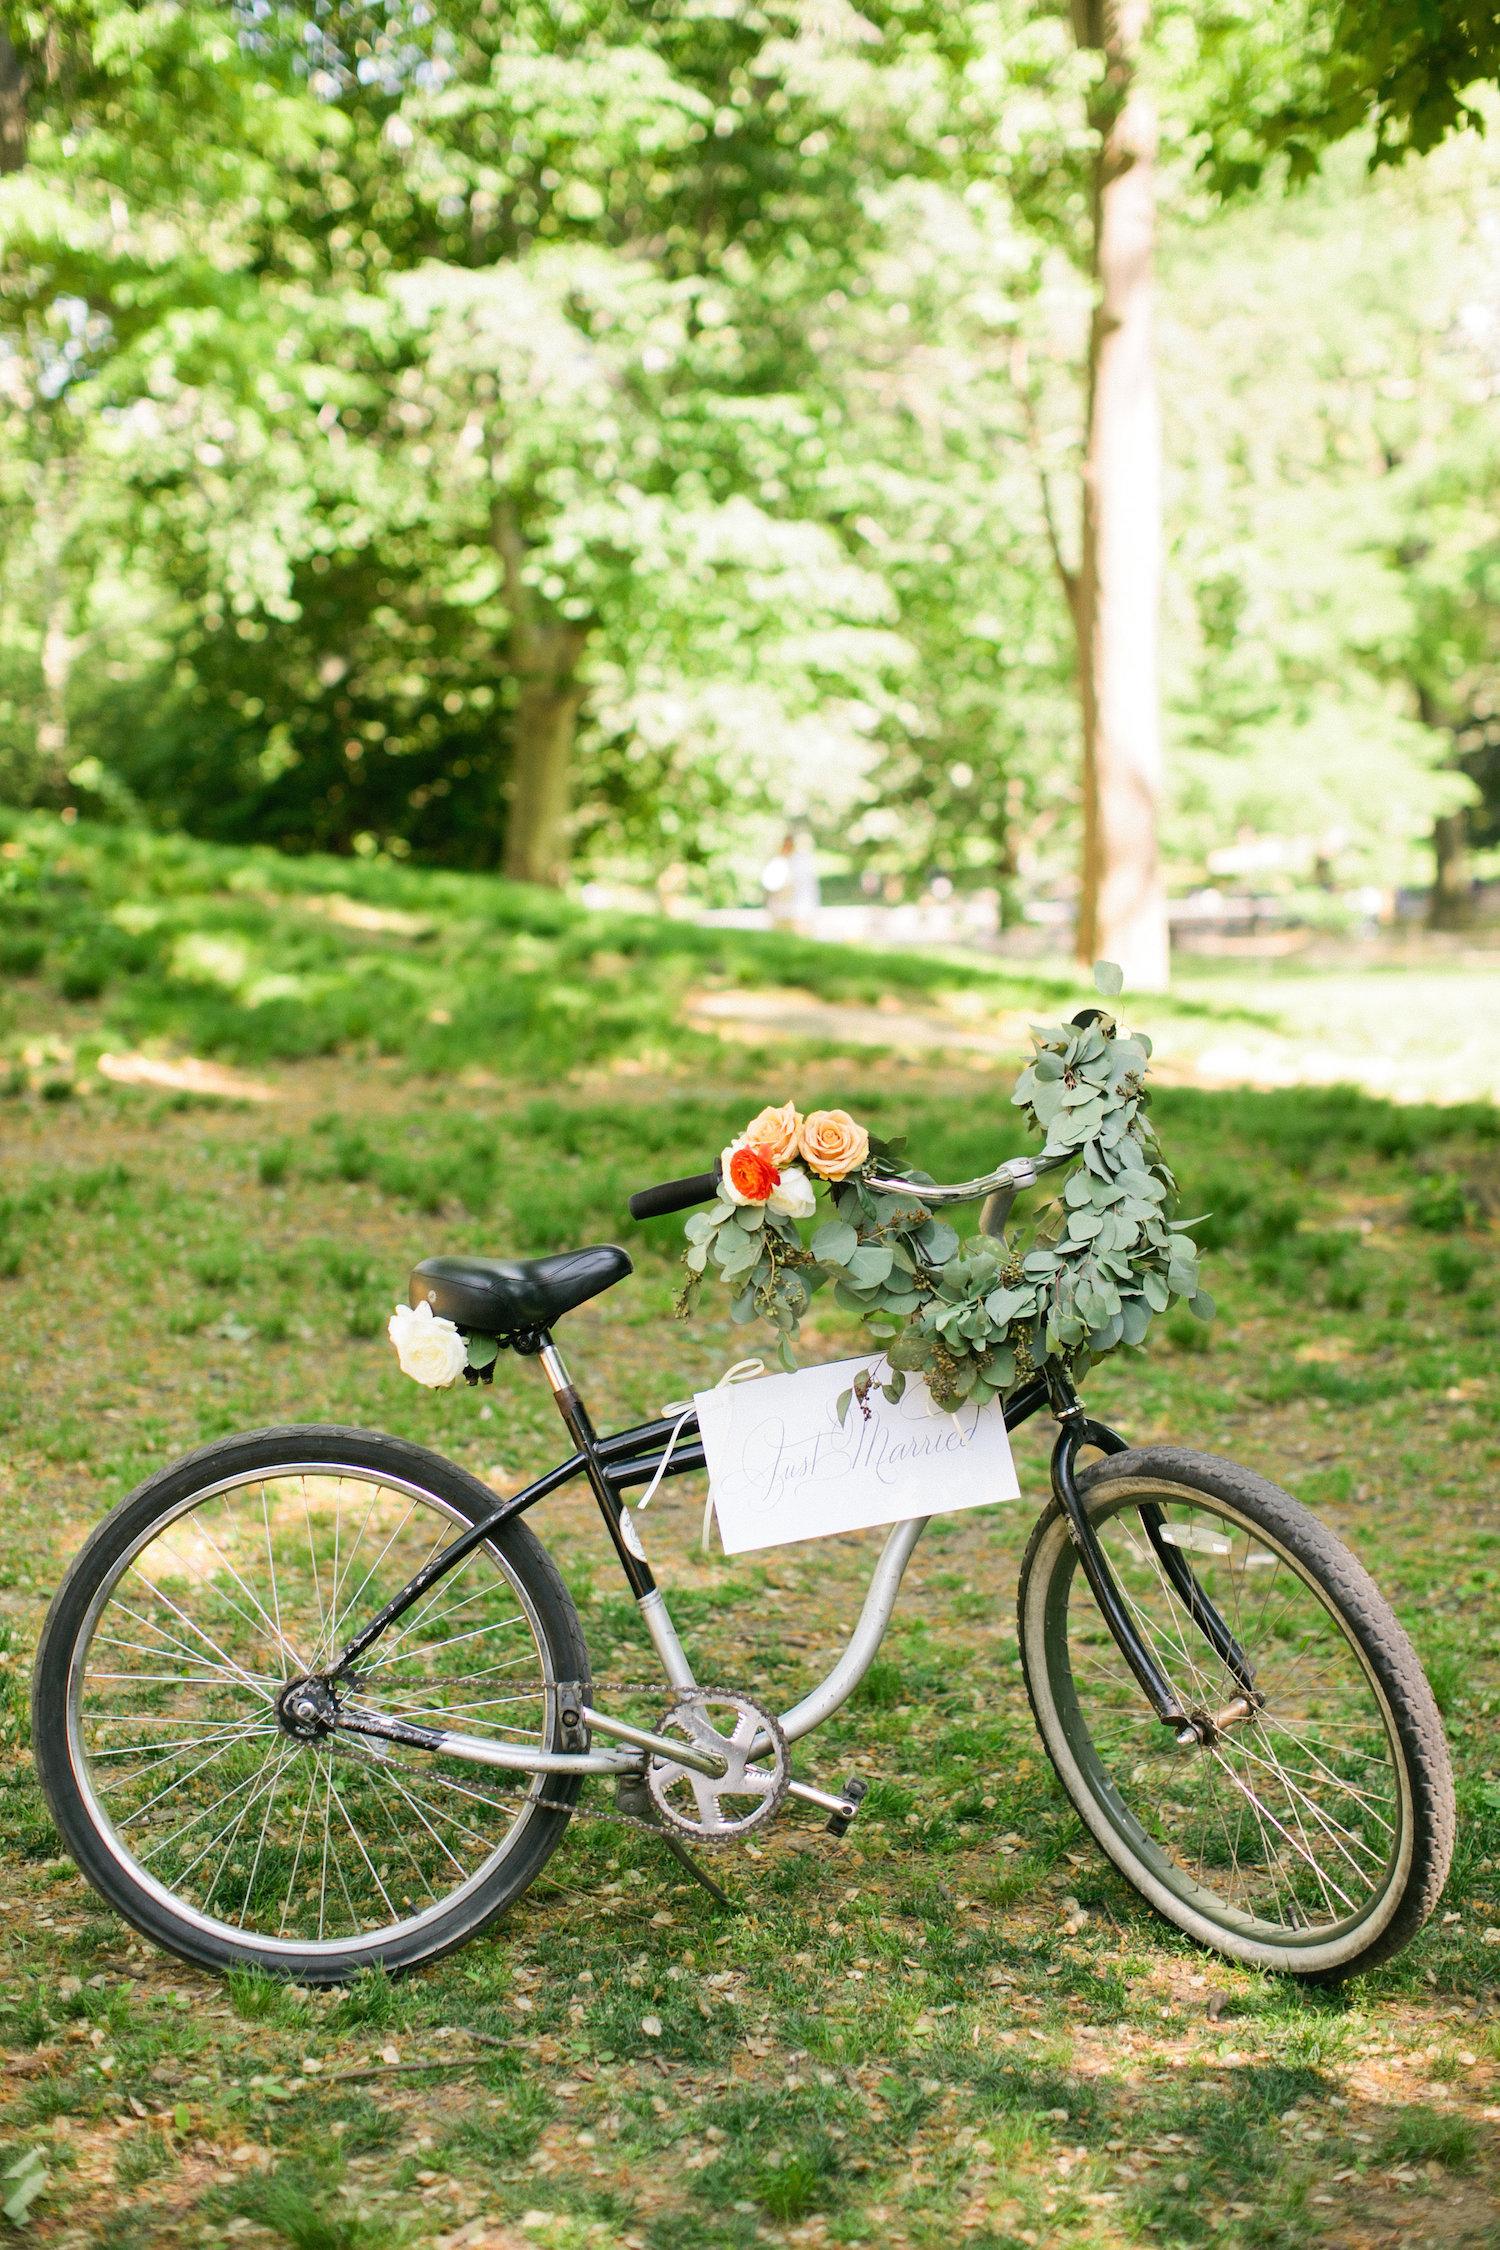 Morning Glow - Full Aperture Floral & Lindsay Madden Photography 121.jpeg